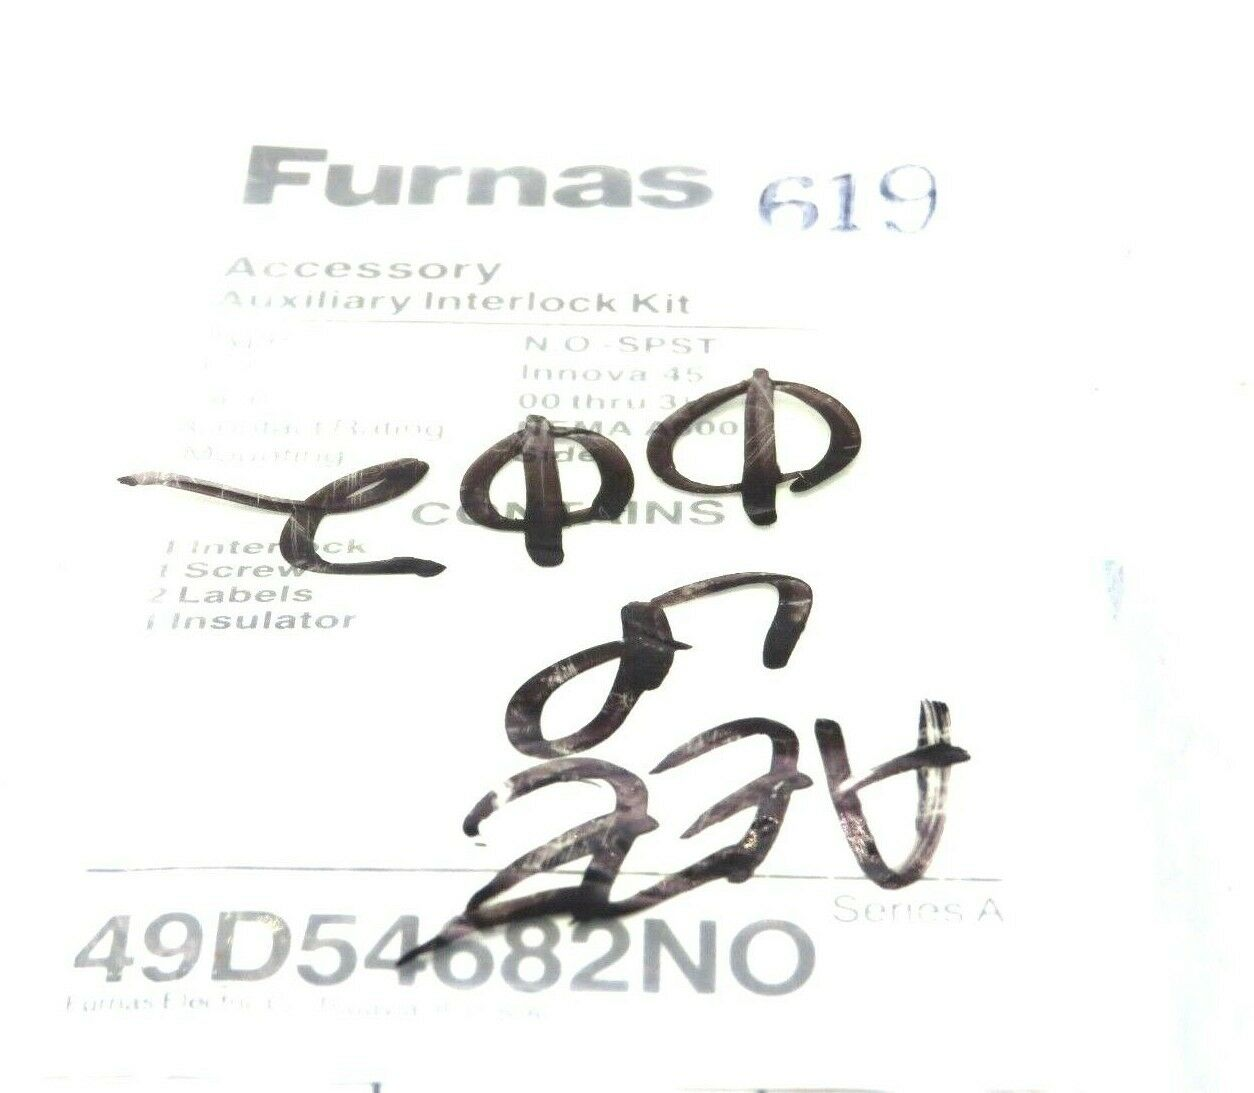 new furnas 49d54682no auxiliary interlock kit series a  u2013 sb industrial supply